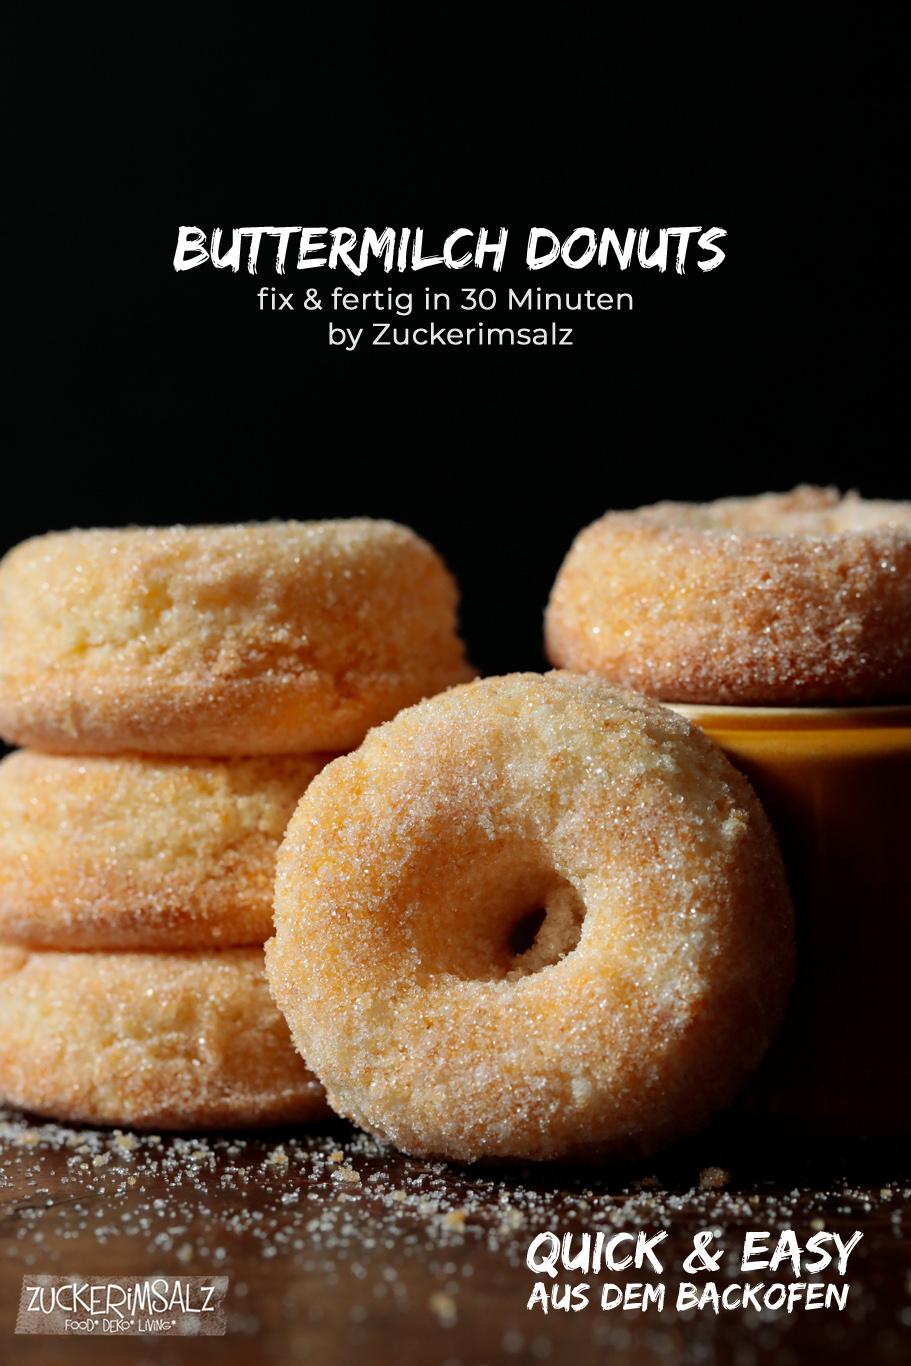 Quick + Easy | Buttermilch Donuts aus dem Backofen